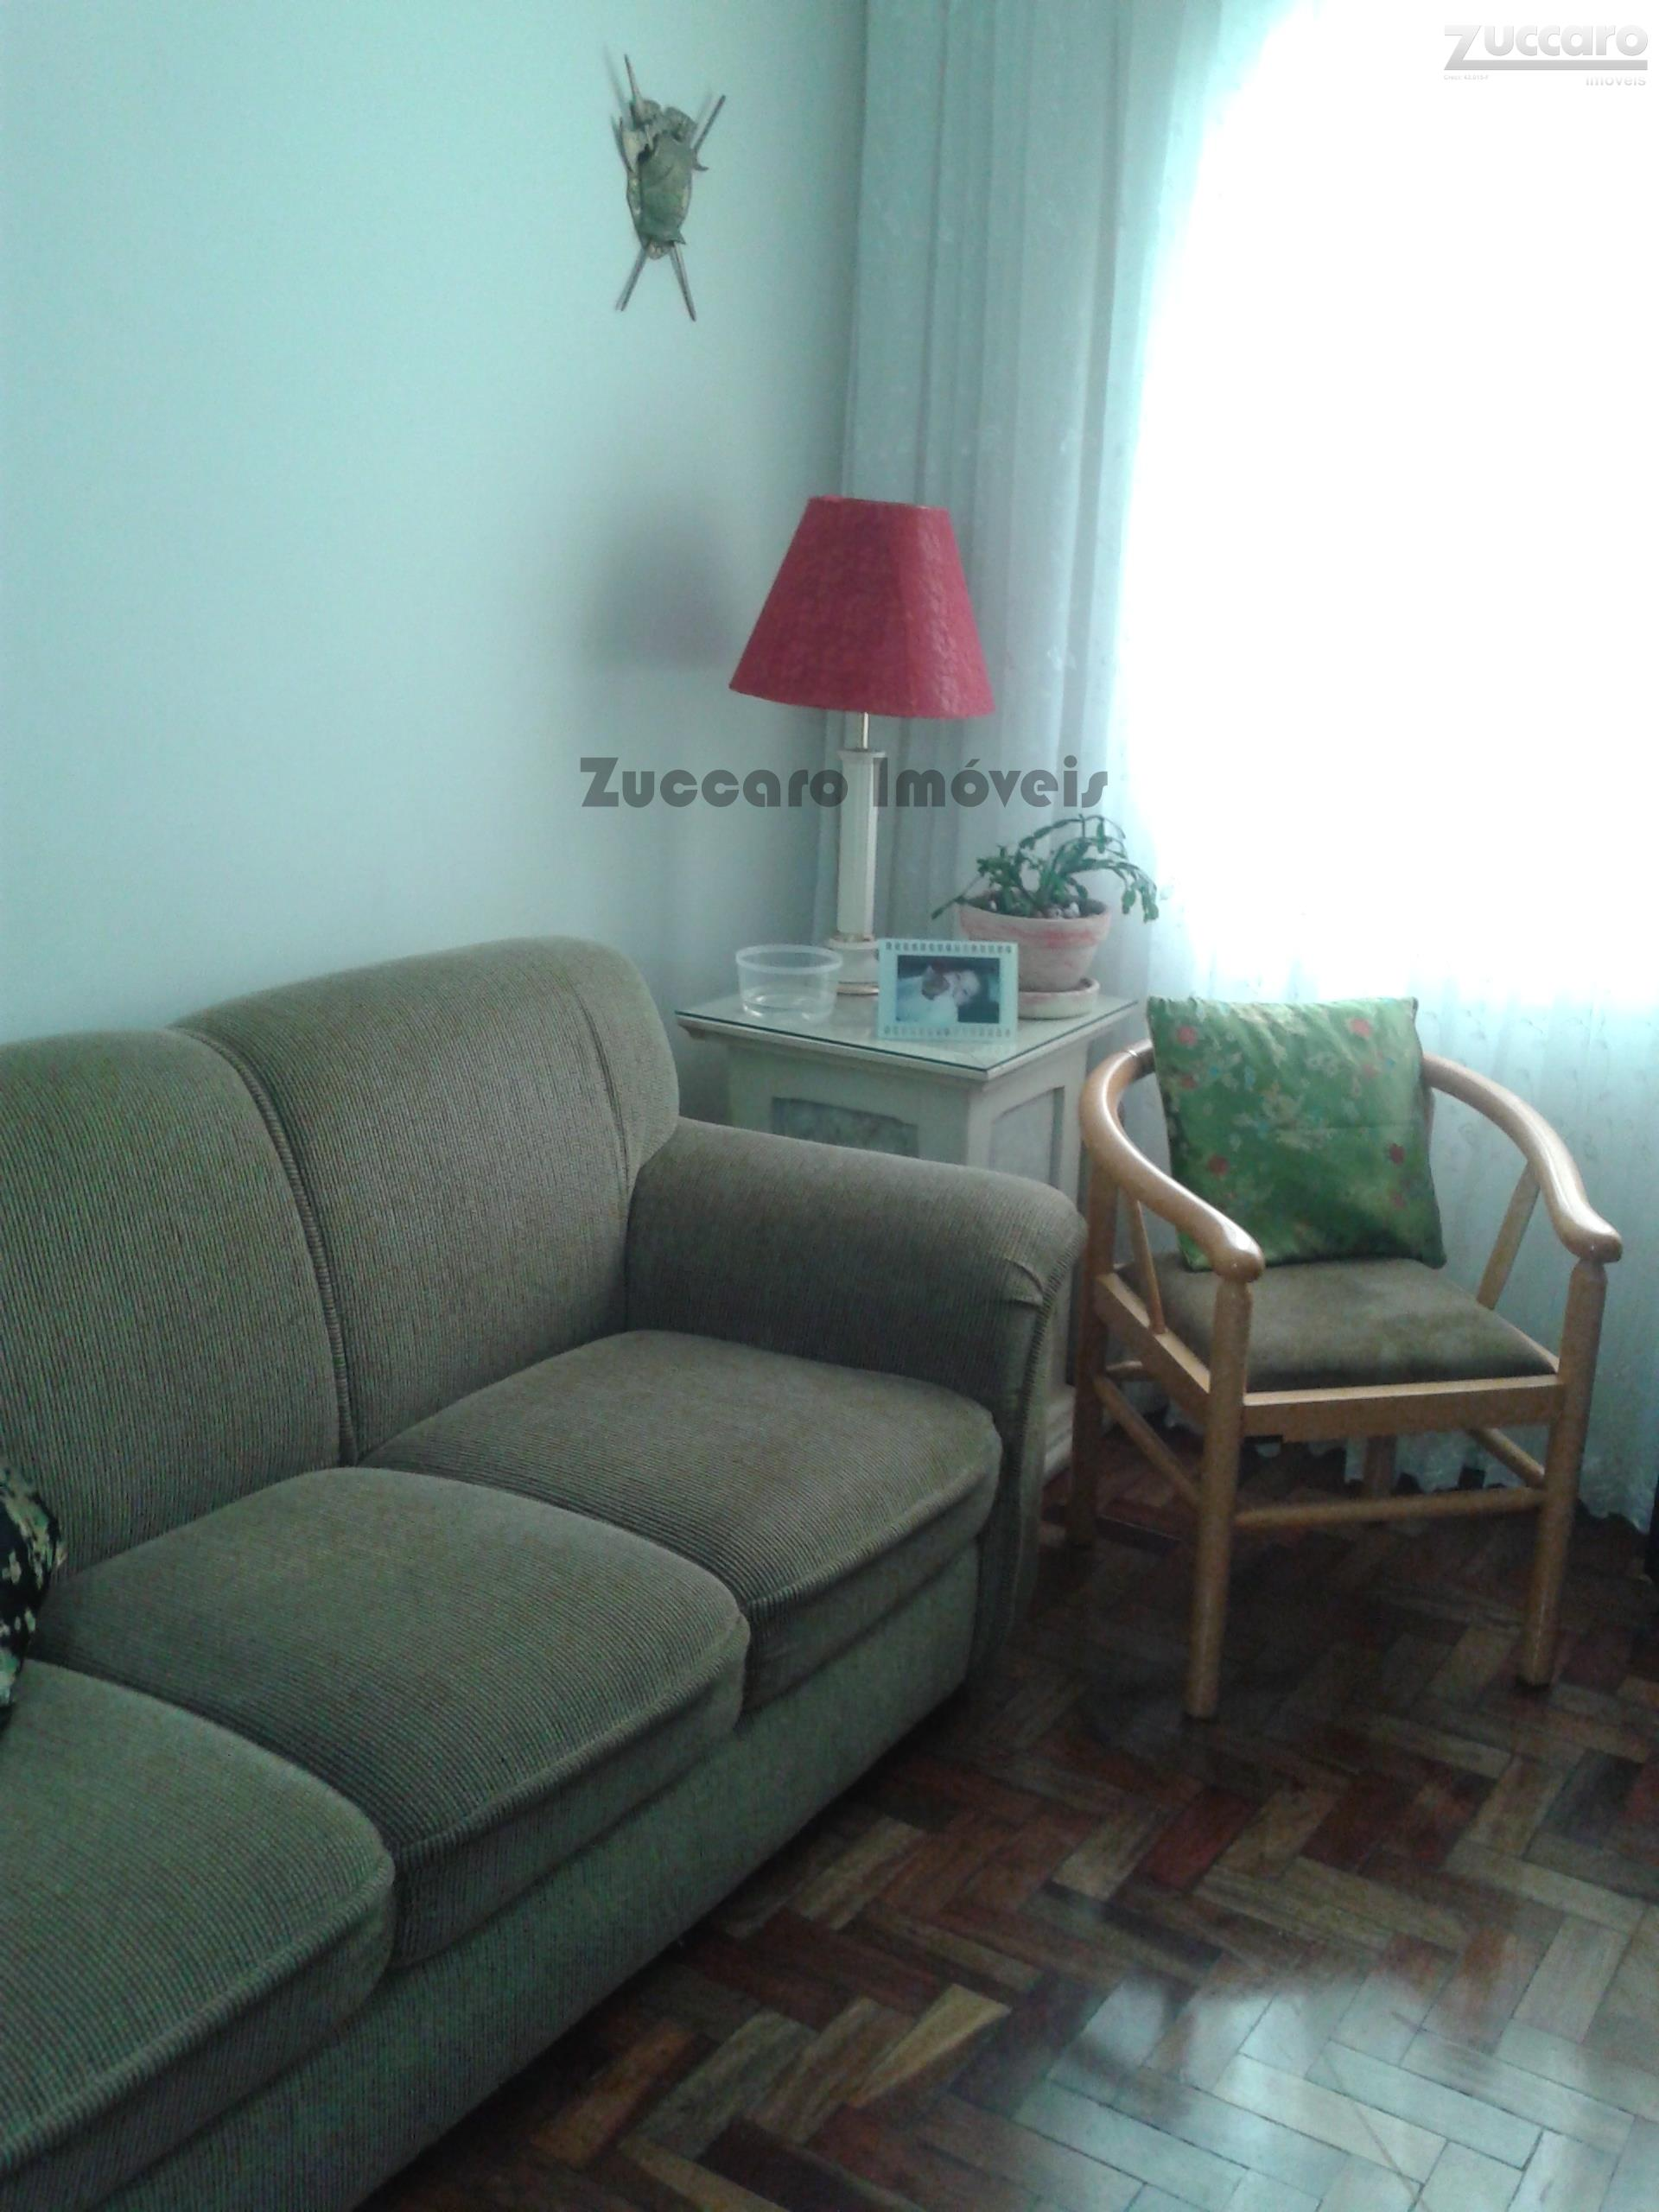 Apartamento Residencial à venda, Jardim Barbosa, Guarulhos - AP0085.